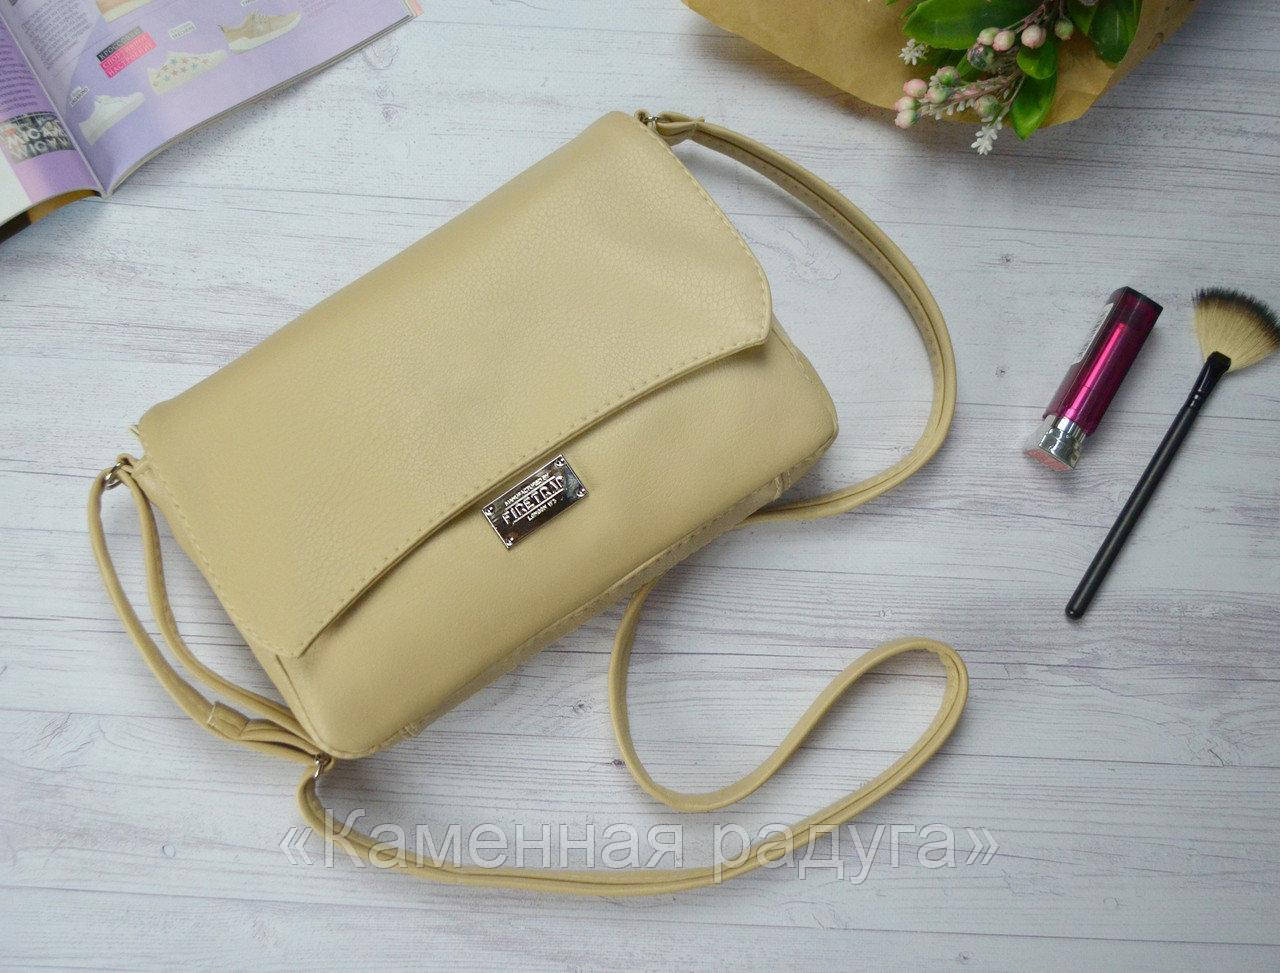 Маленькая бежевая сумочка